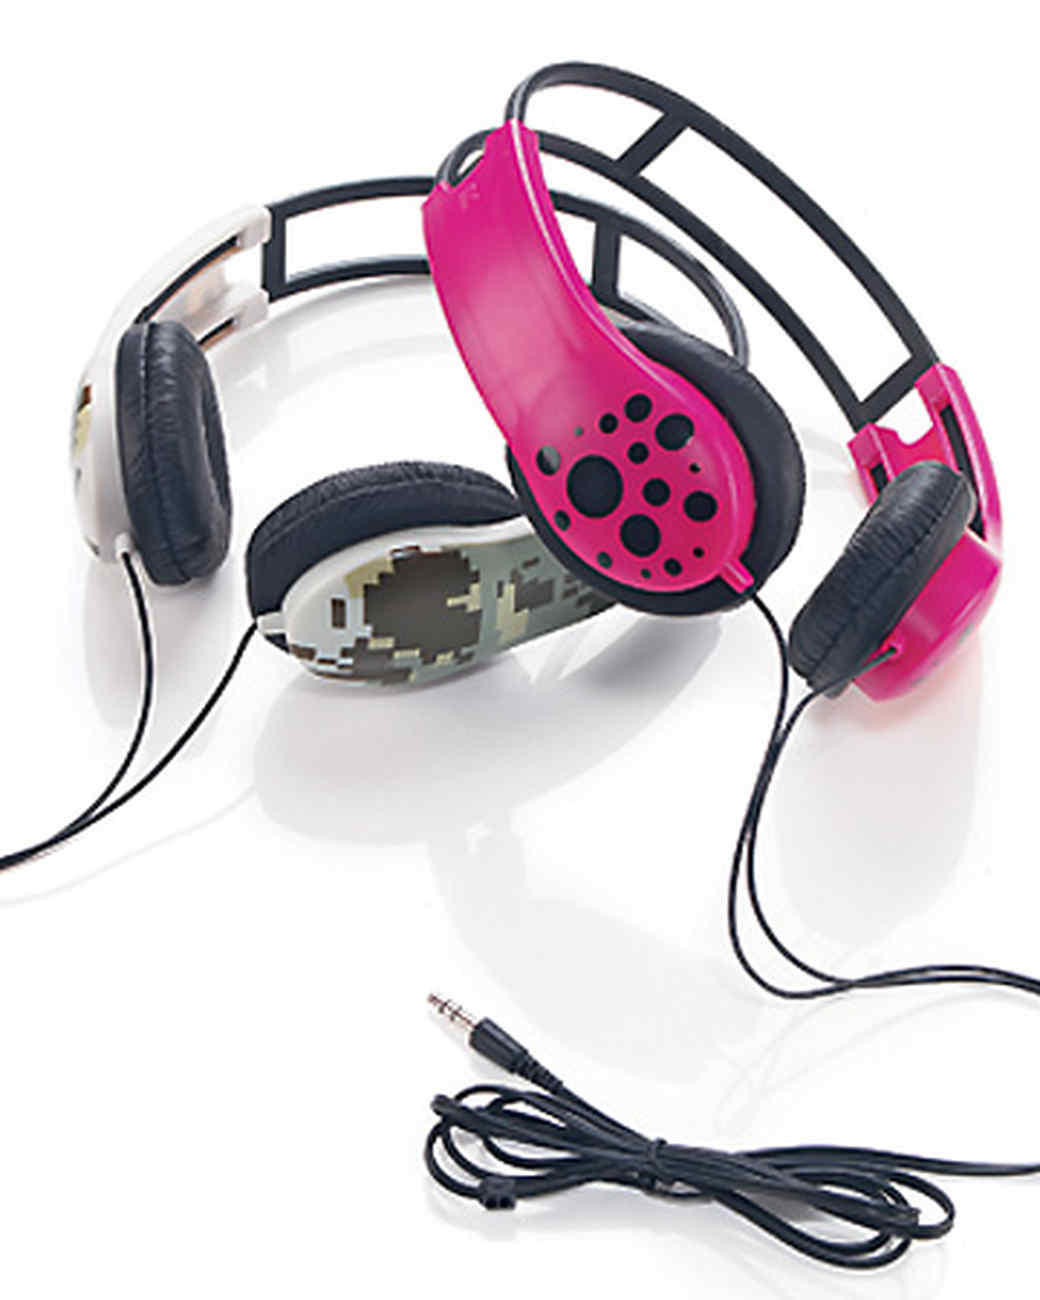 avon_headphones_7.jpg